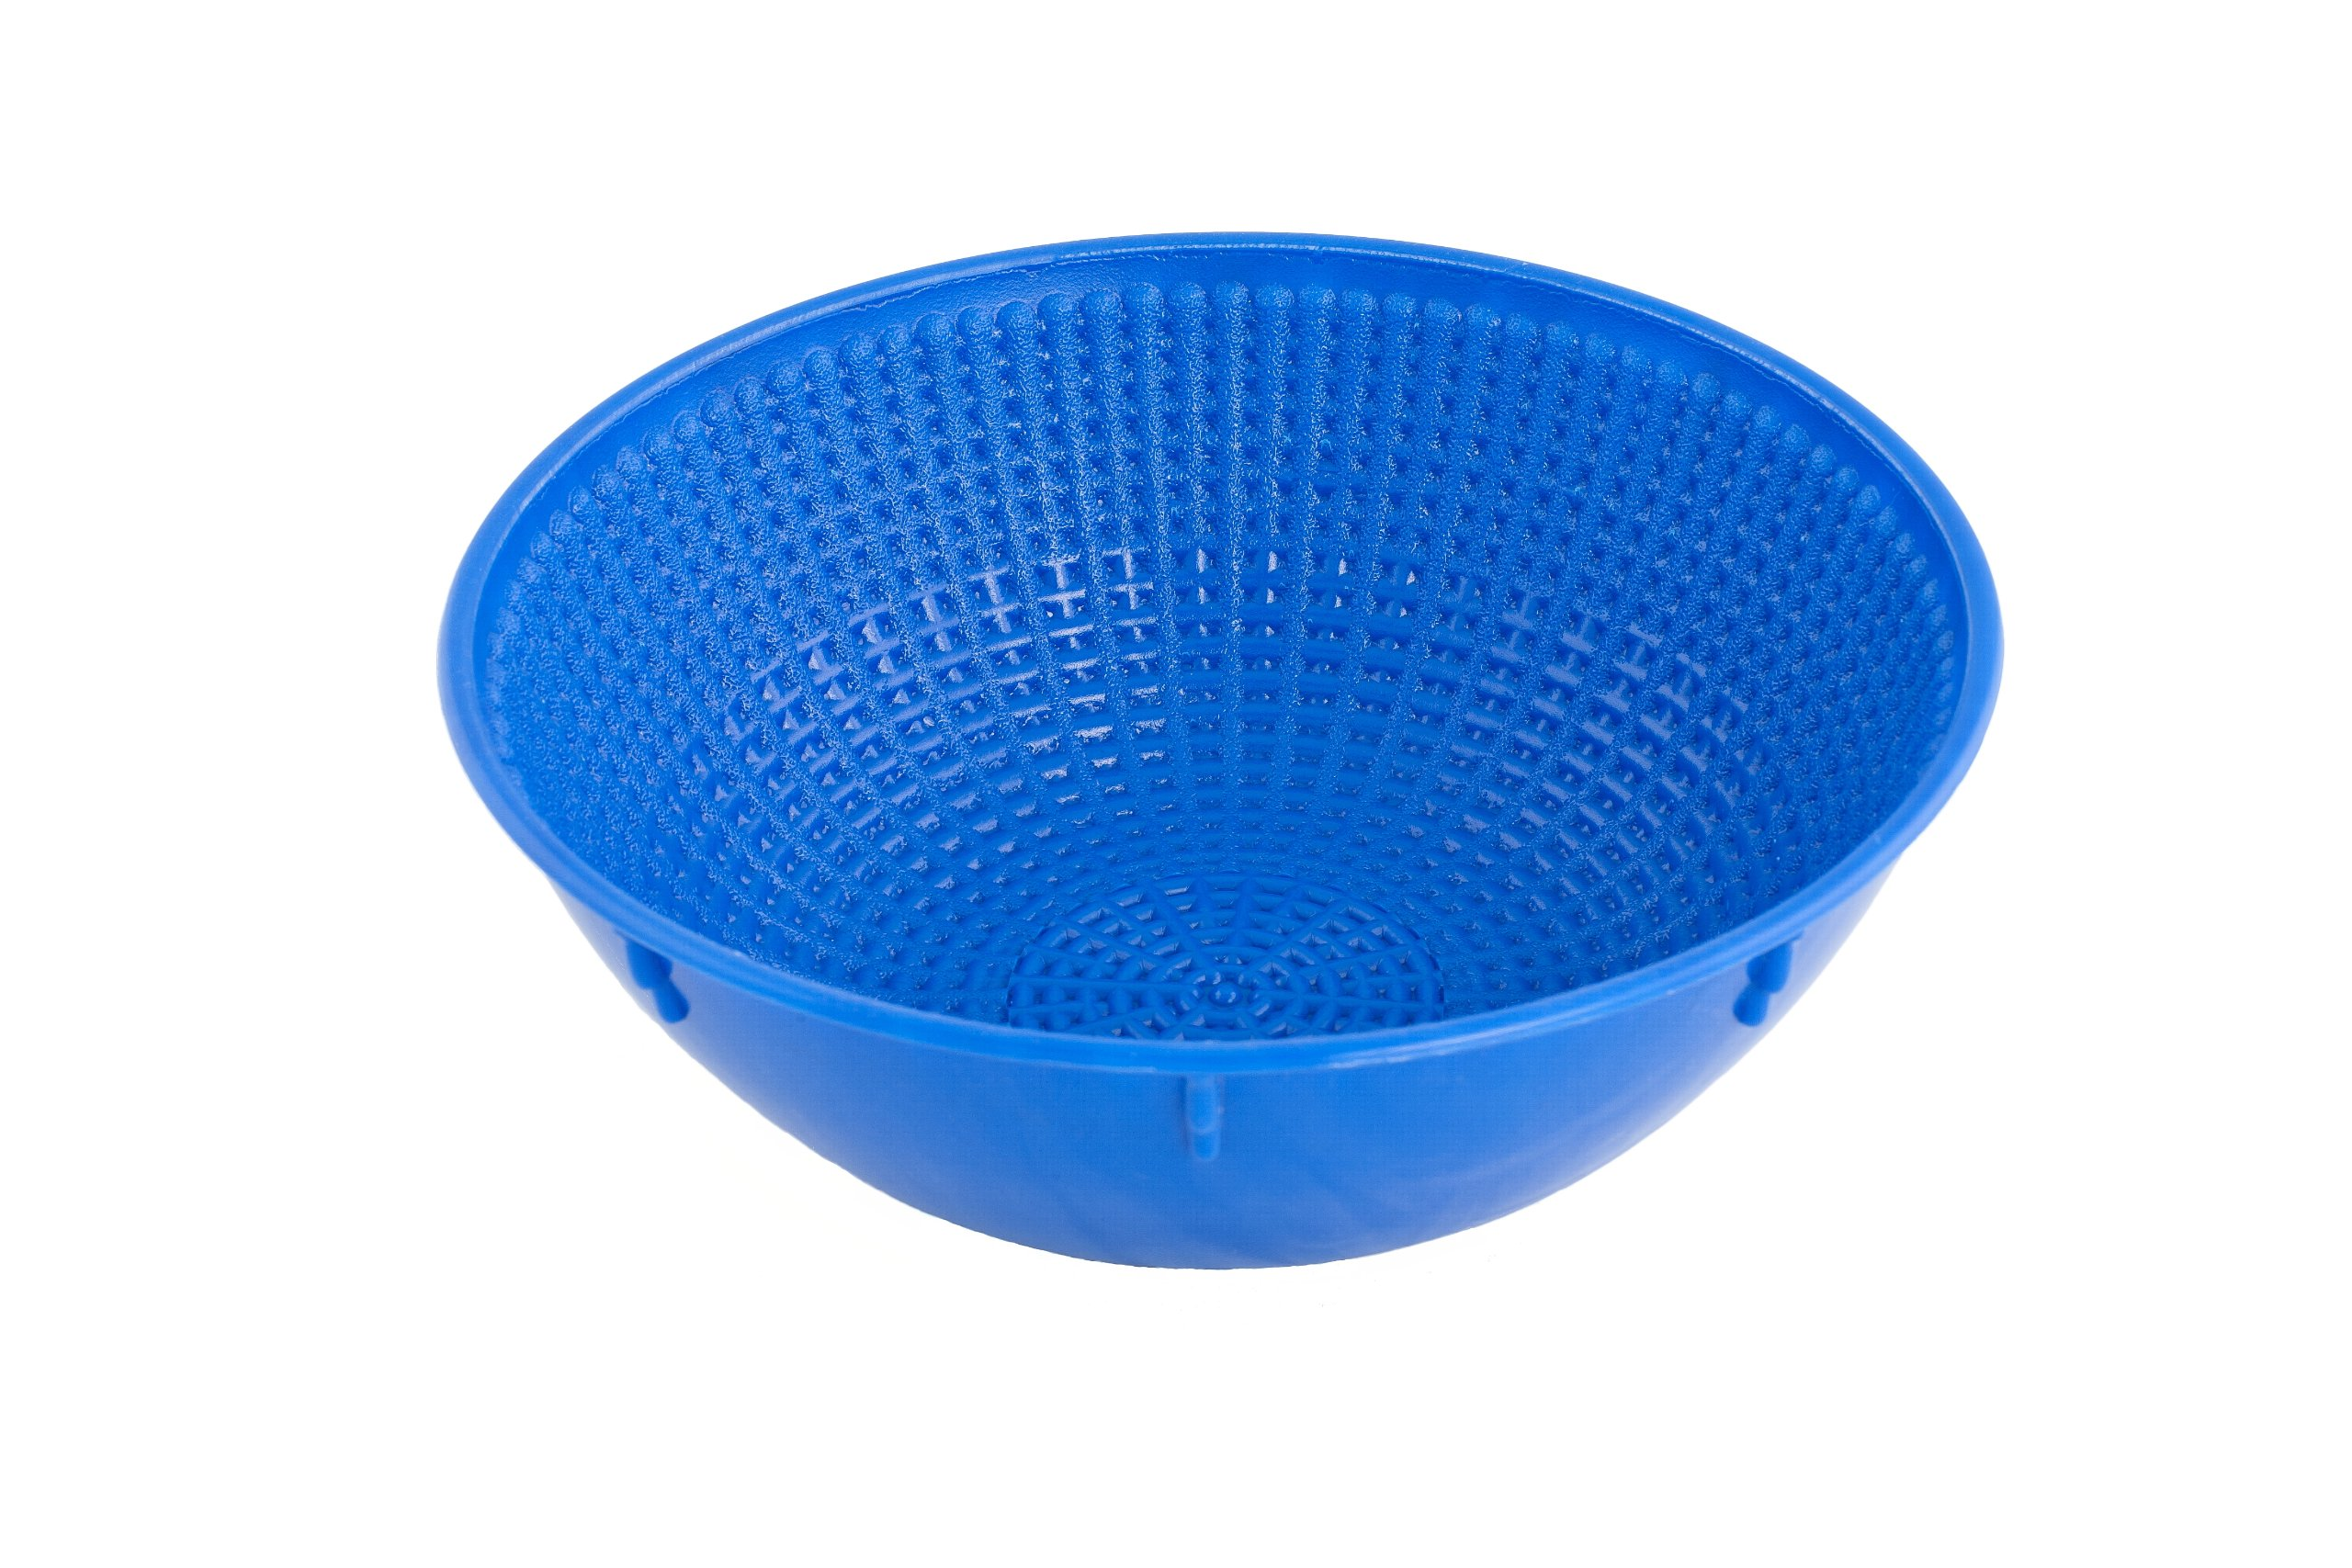 Paderno World Cuisine 10-Inch Round Blue Proofing Basket (1.5 Kilo)